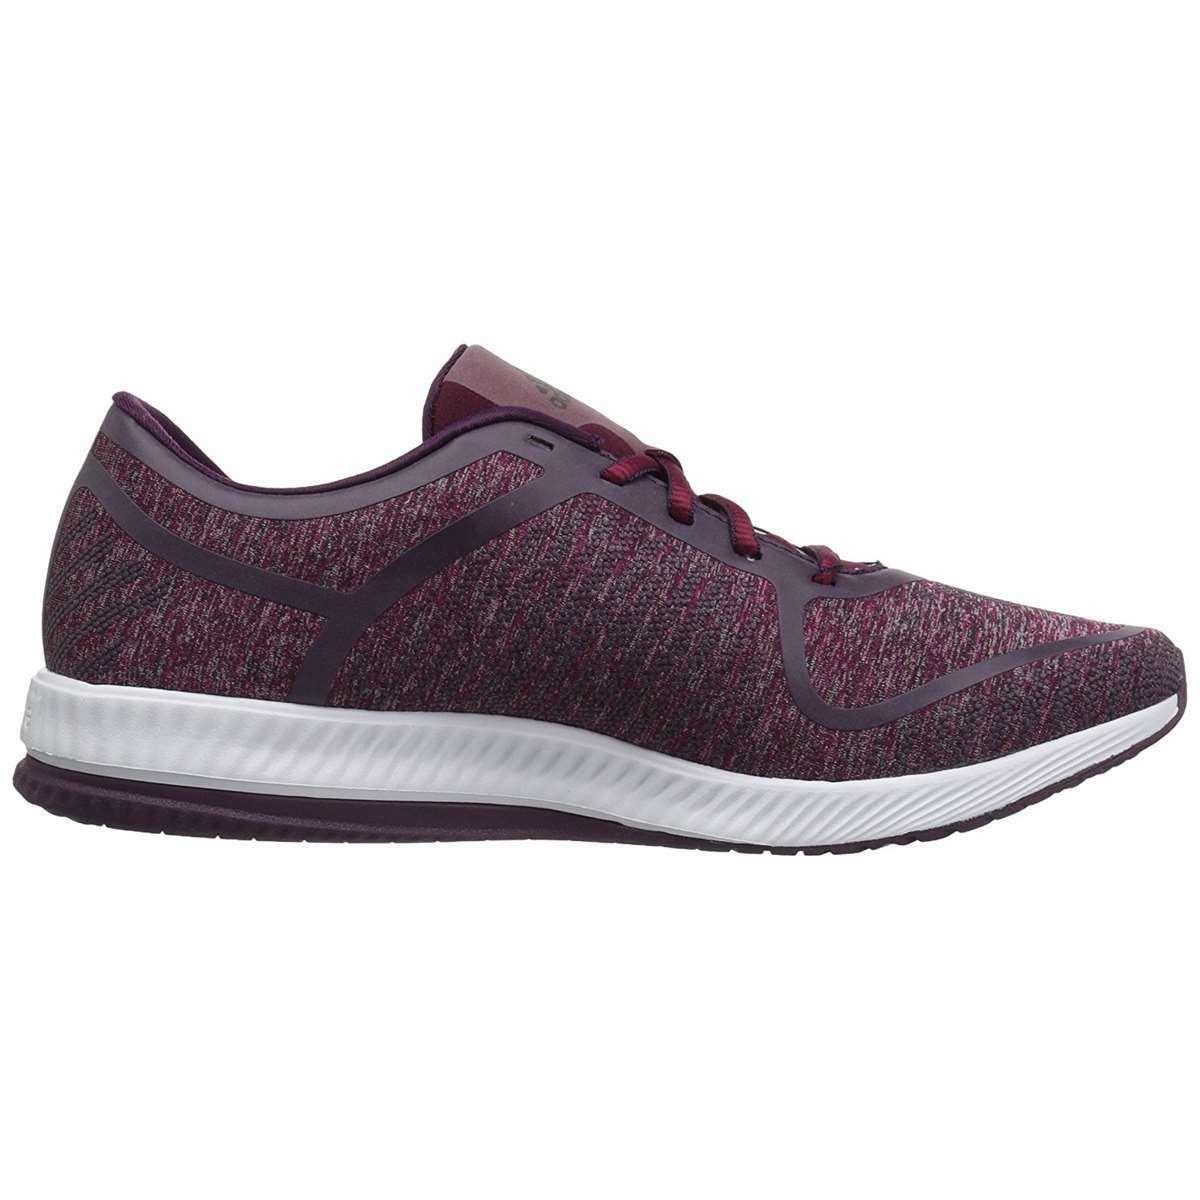 NEW Adidas Damens Trainer Athletics B Schuhes Cross Trainer Damens Schuhes e180fe